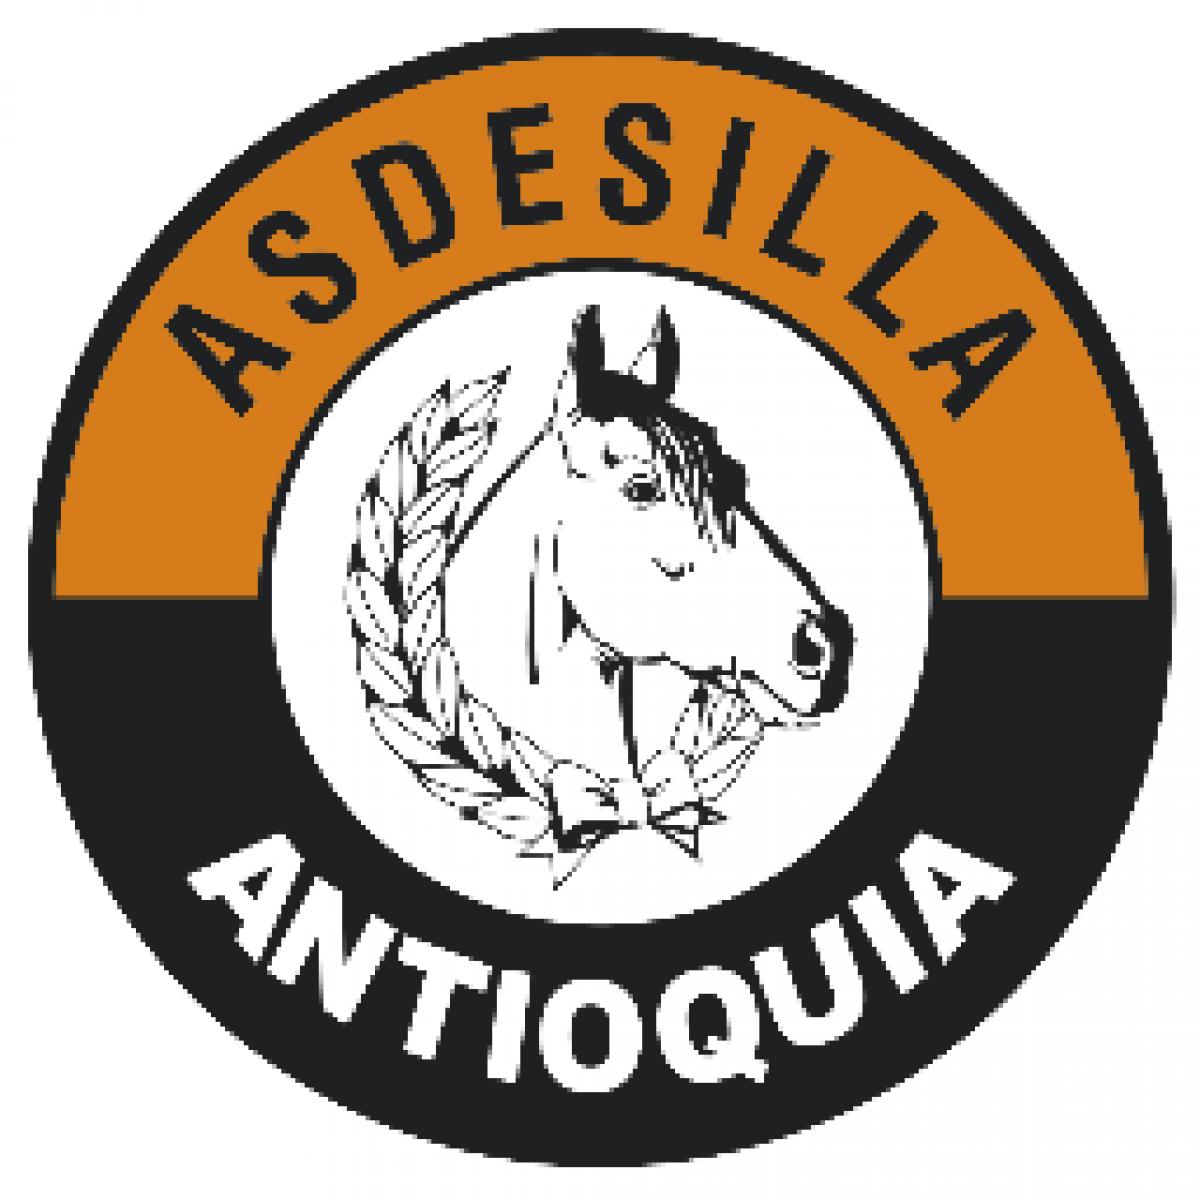 CARTA De Asdesilla a Fedequinas Sobre La XIII Mundial Confepaso 2017